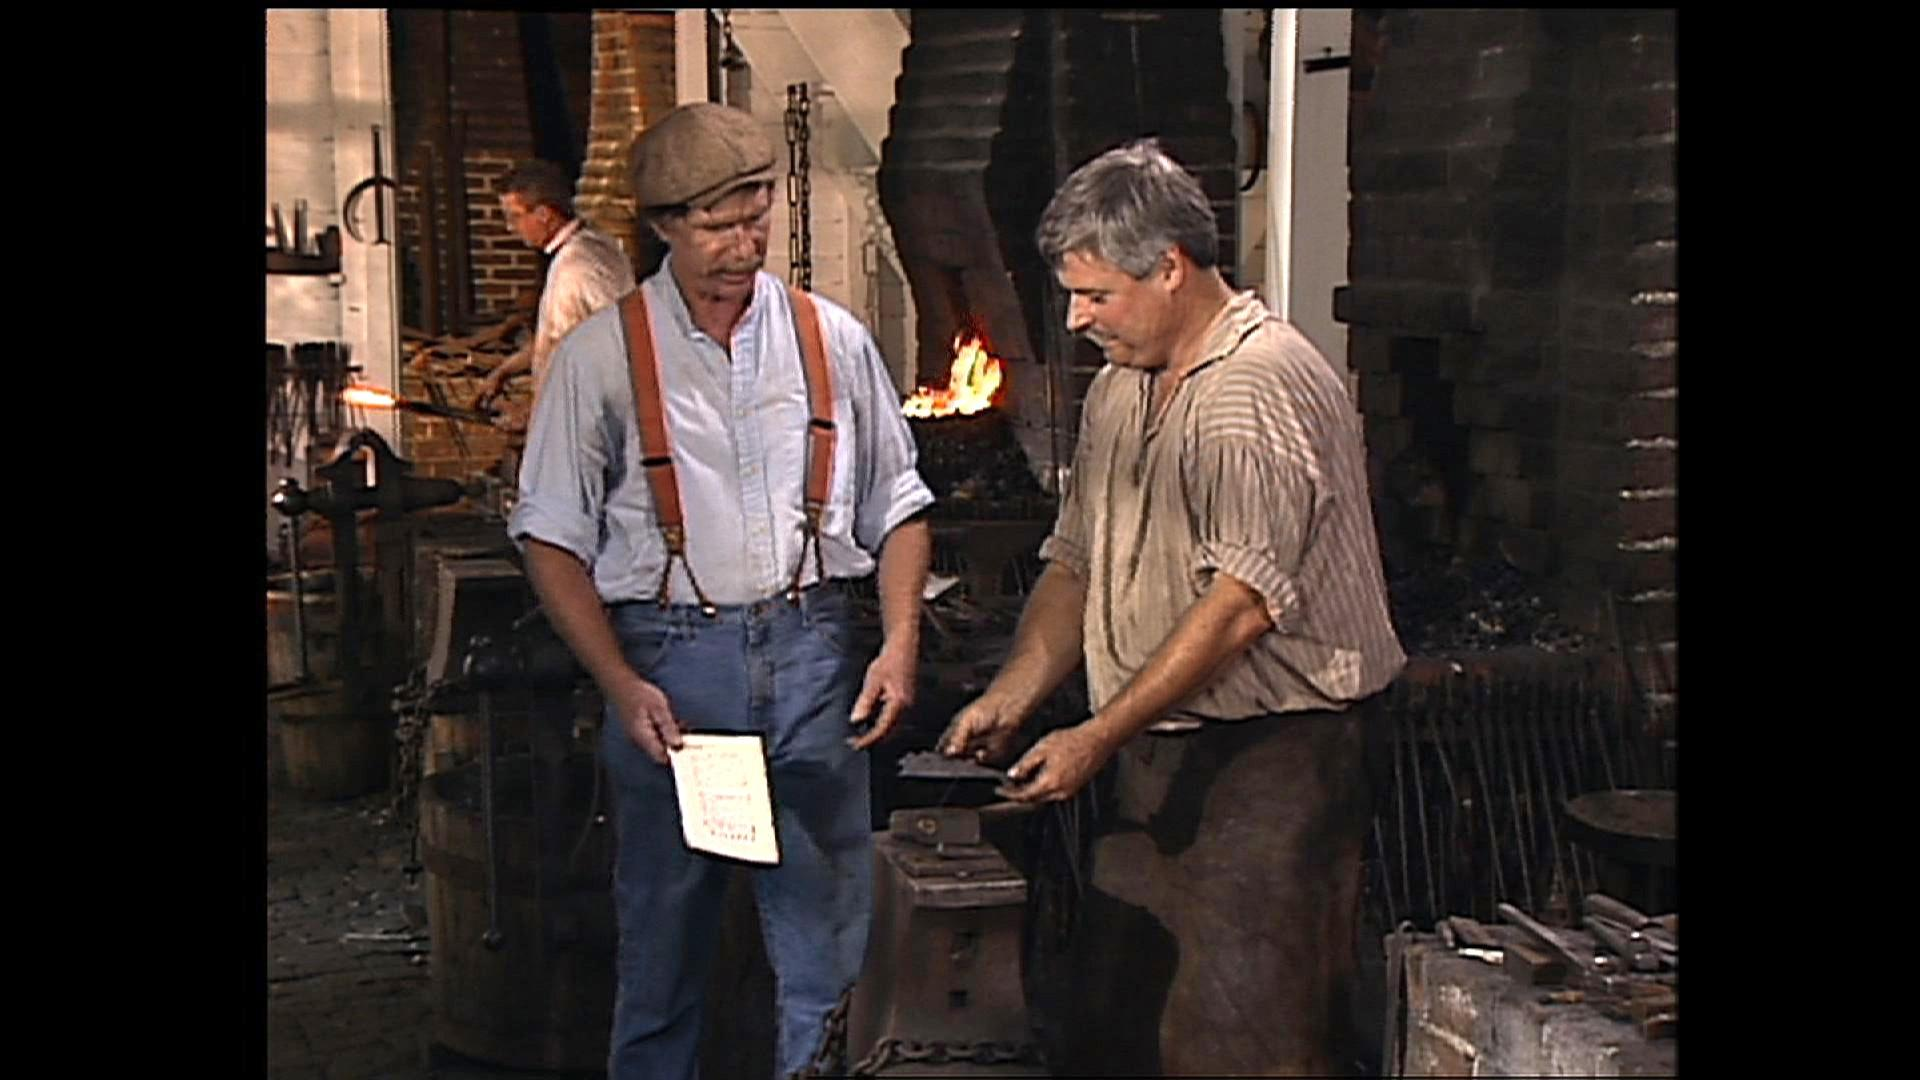 The Sordid Blacksmith image